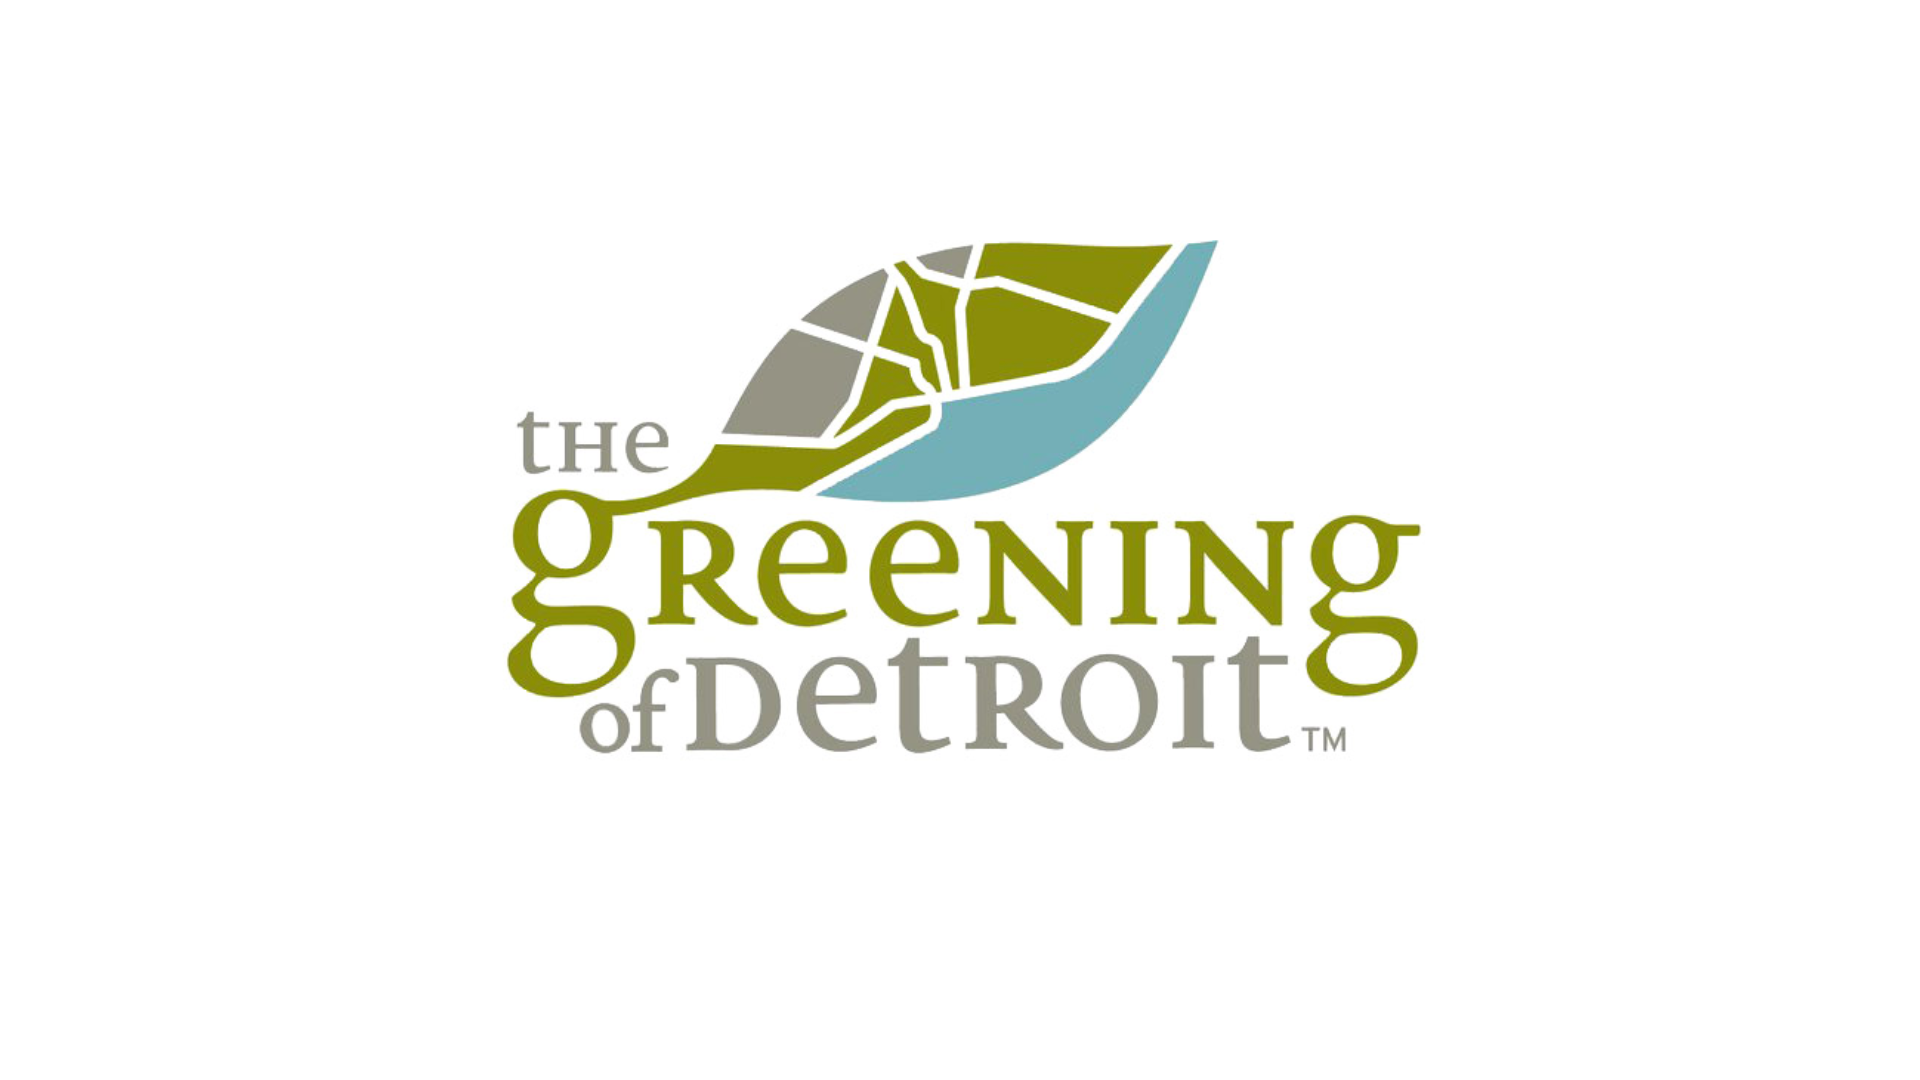 The Greening of Detroit